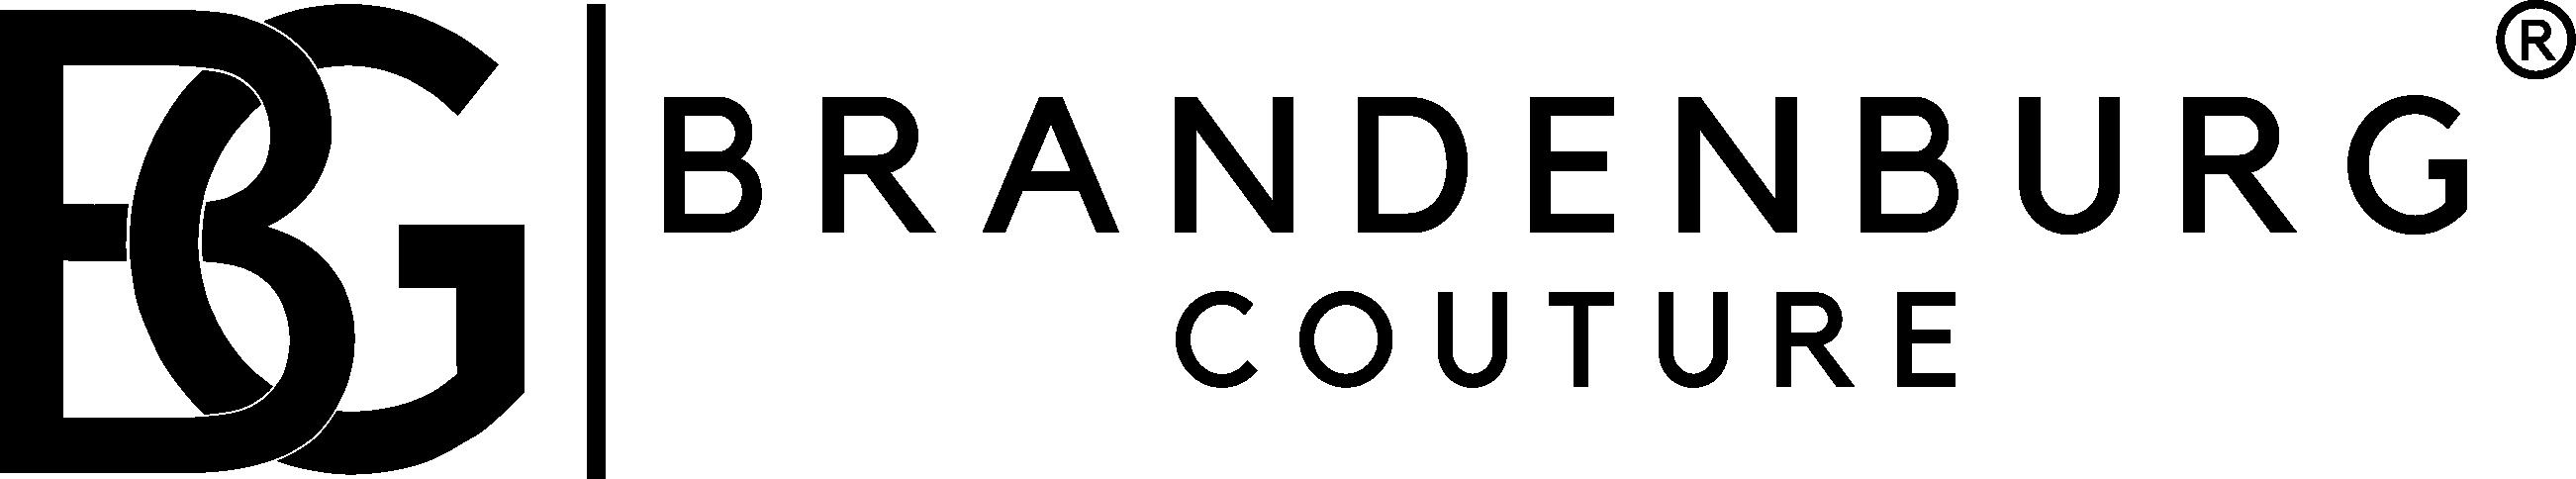 Brandenburg Couture